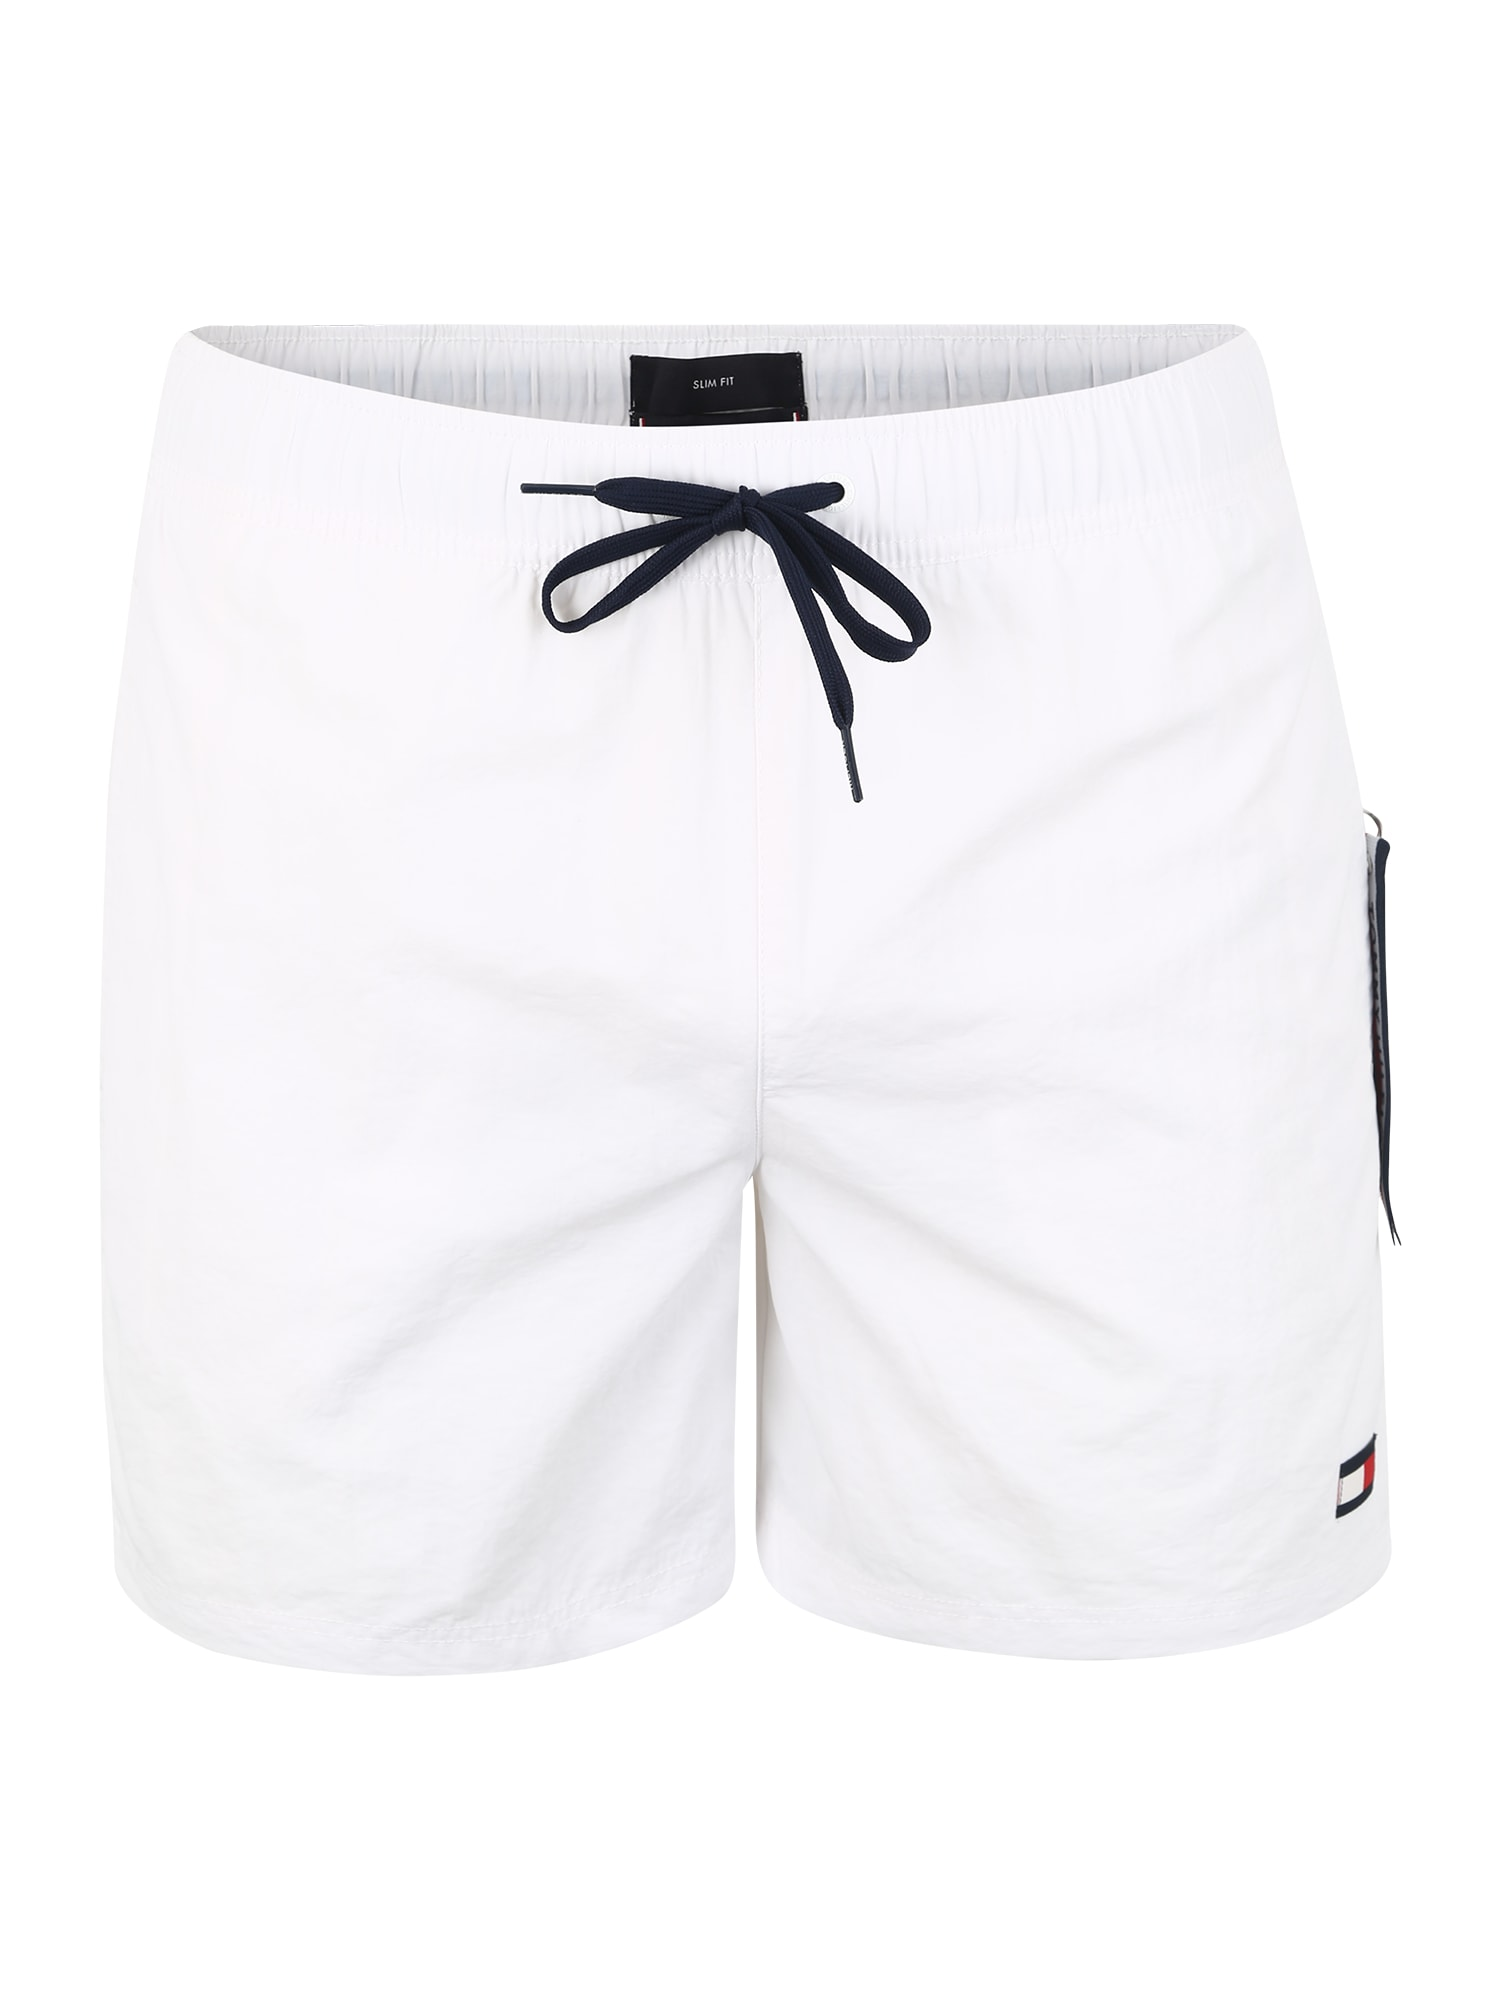 Plavecké šortky SF MEDIUM DRAWSTRING bílá Tommy Hilfiger Underwear